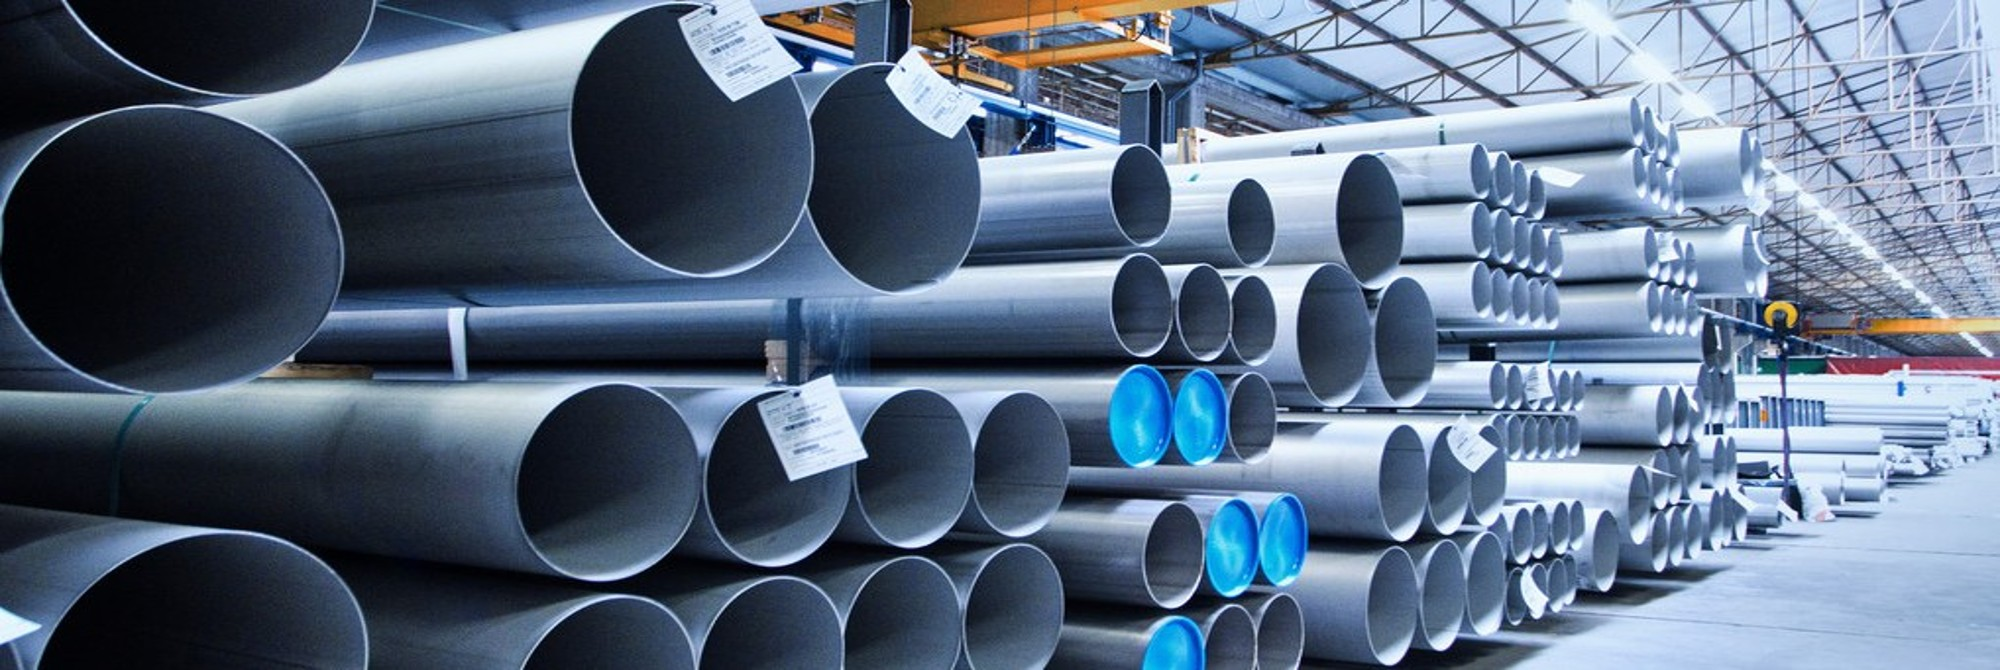 Overzicht producten thyssenkrupp Materials Belgium